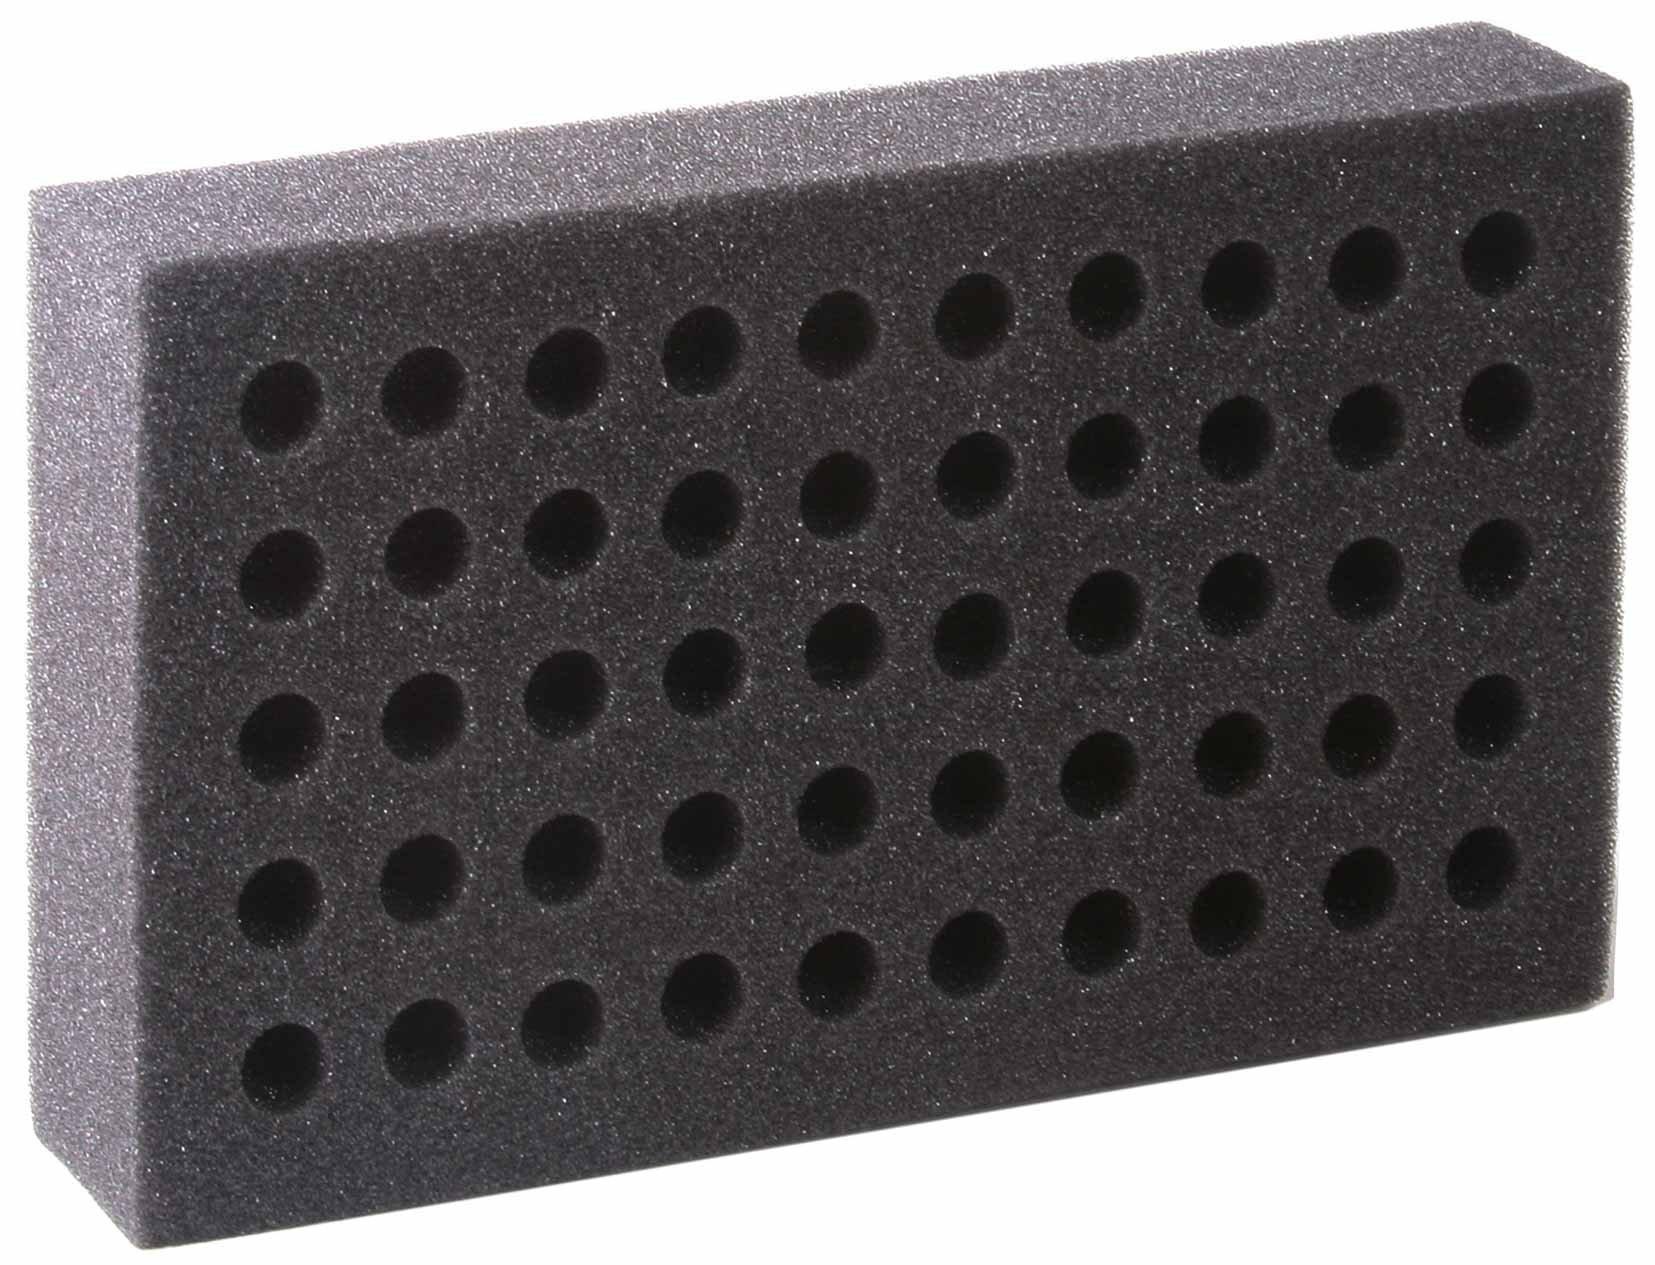 Foam Test Tube Racks For 15x85mm, 16x100mm, 16x125mm & 16x150mm Tubes